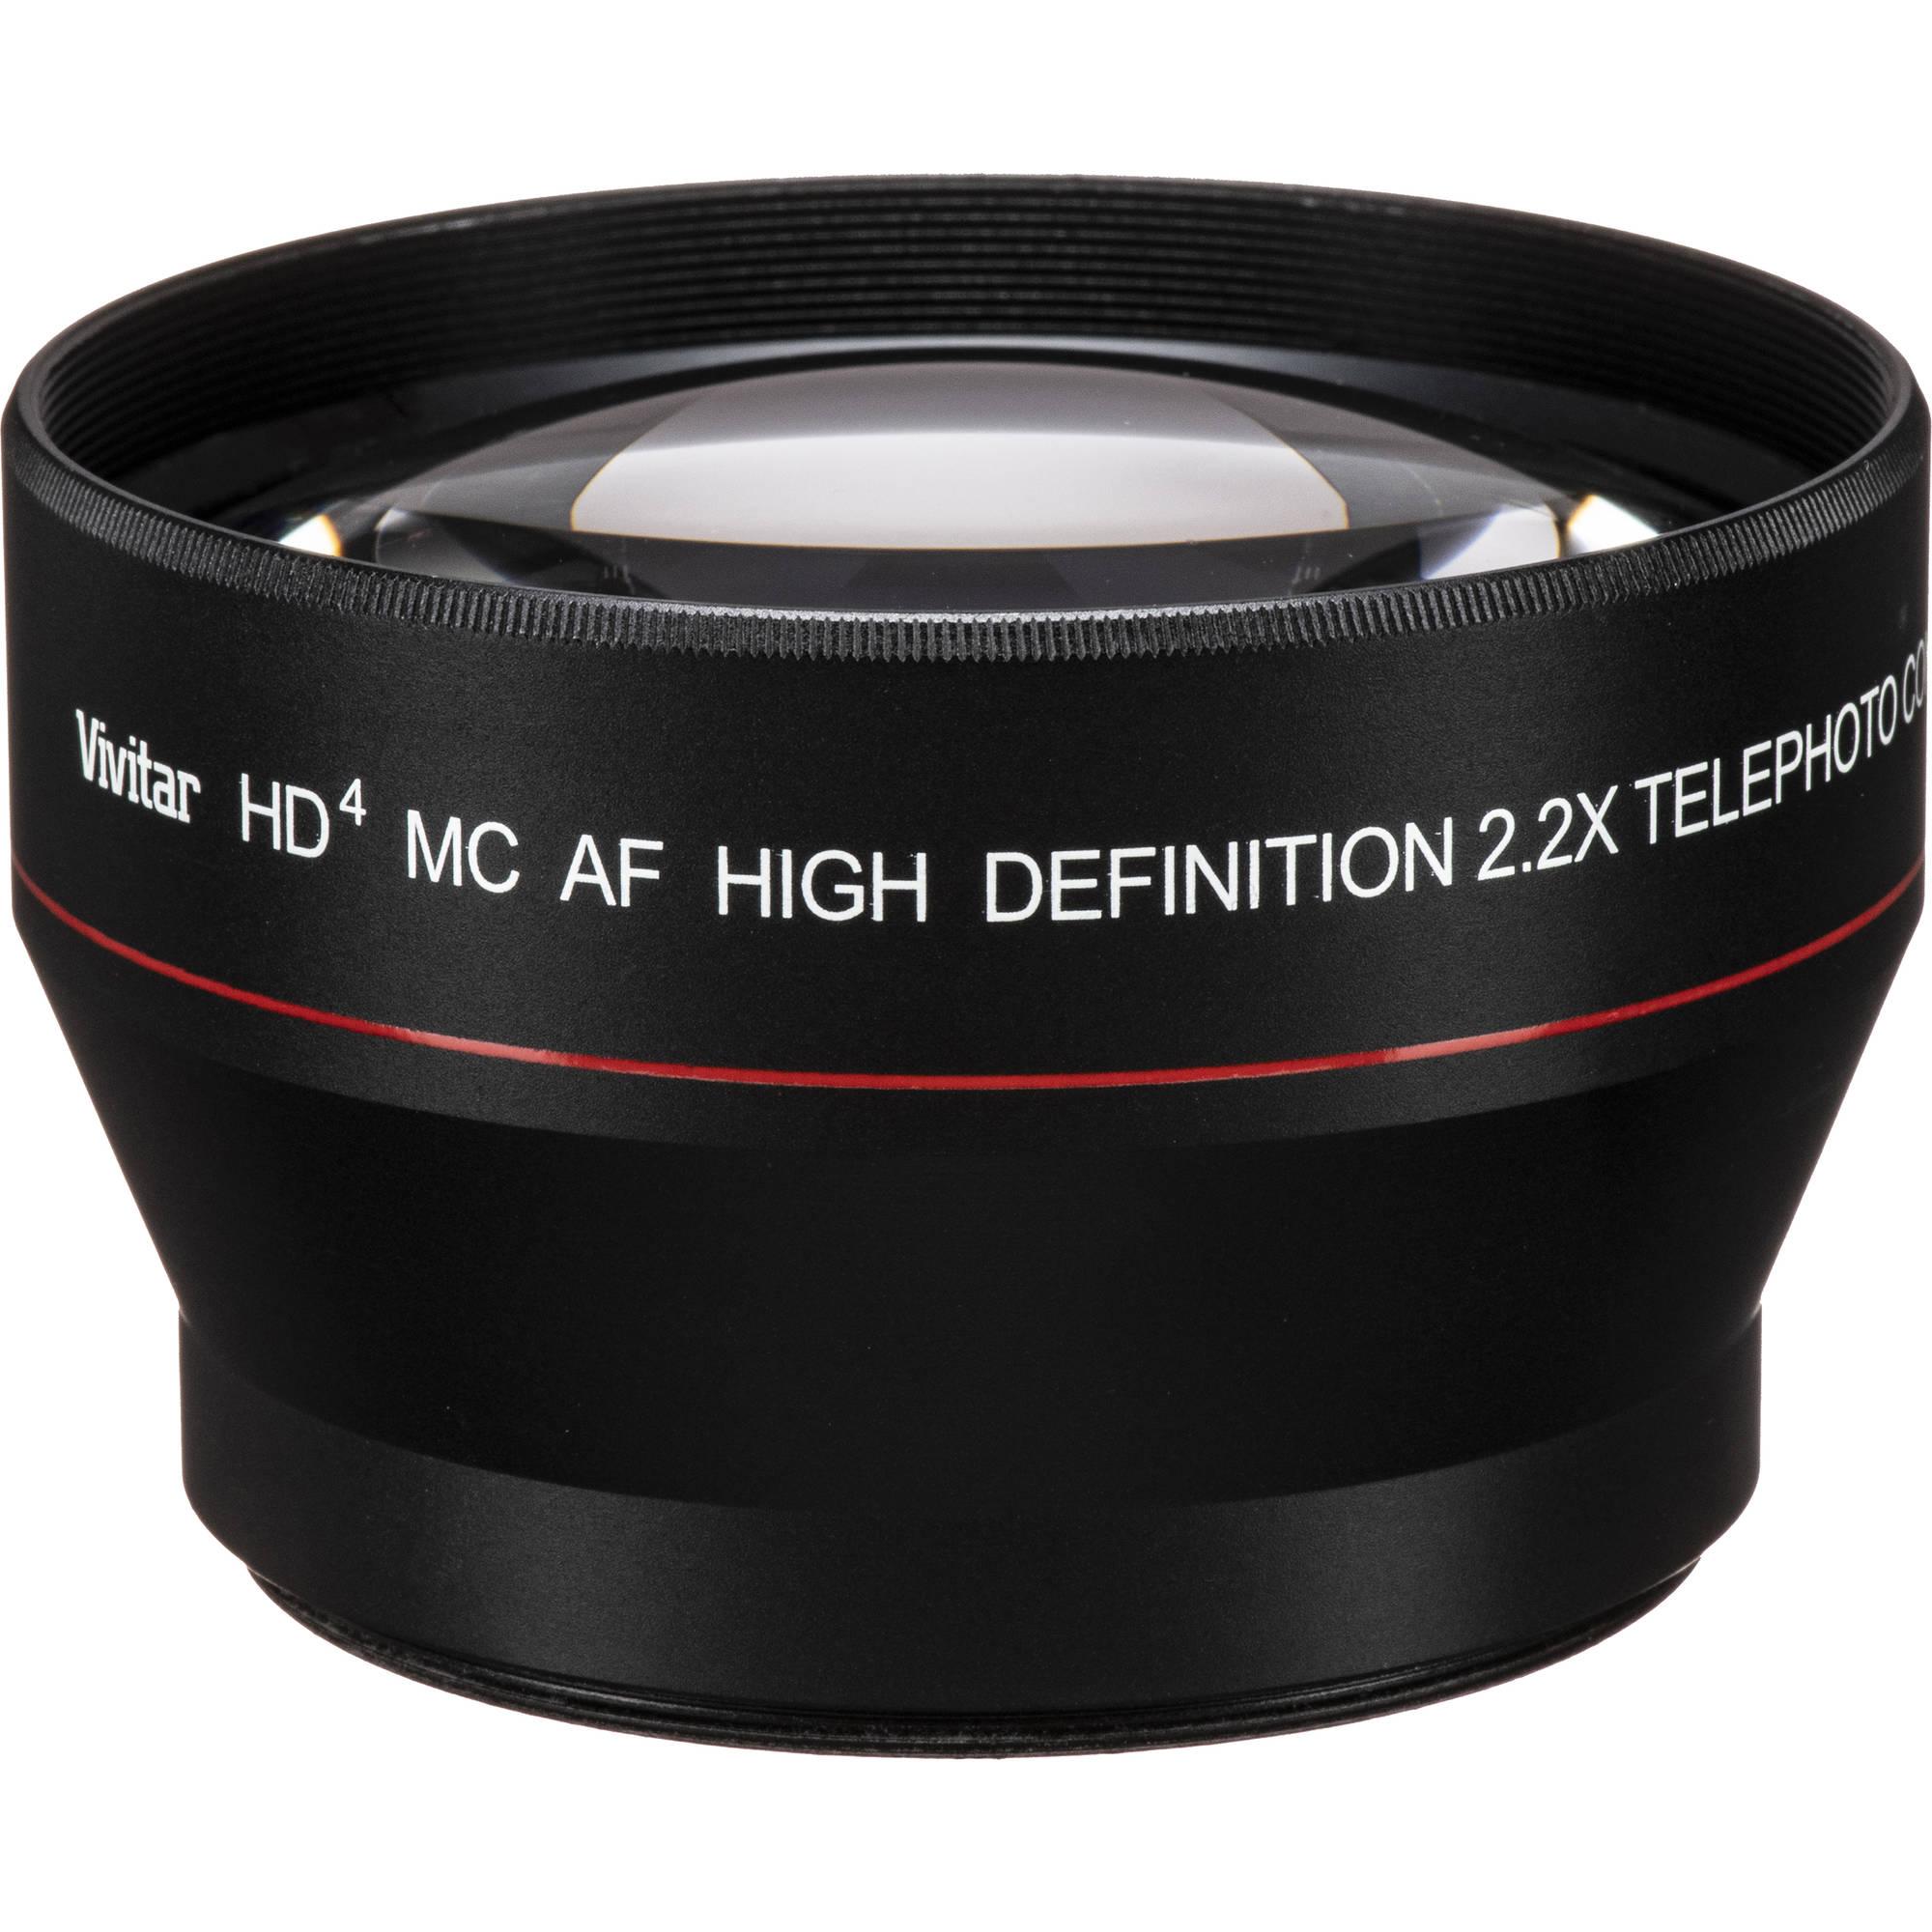 Vivitar 67mm 22x Telephoto Attachment Lens Viv 67t Bh Photo